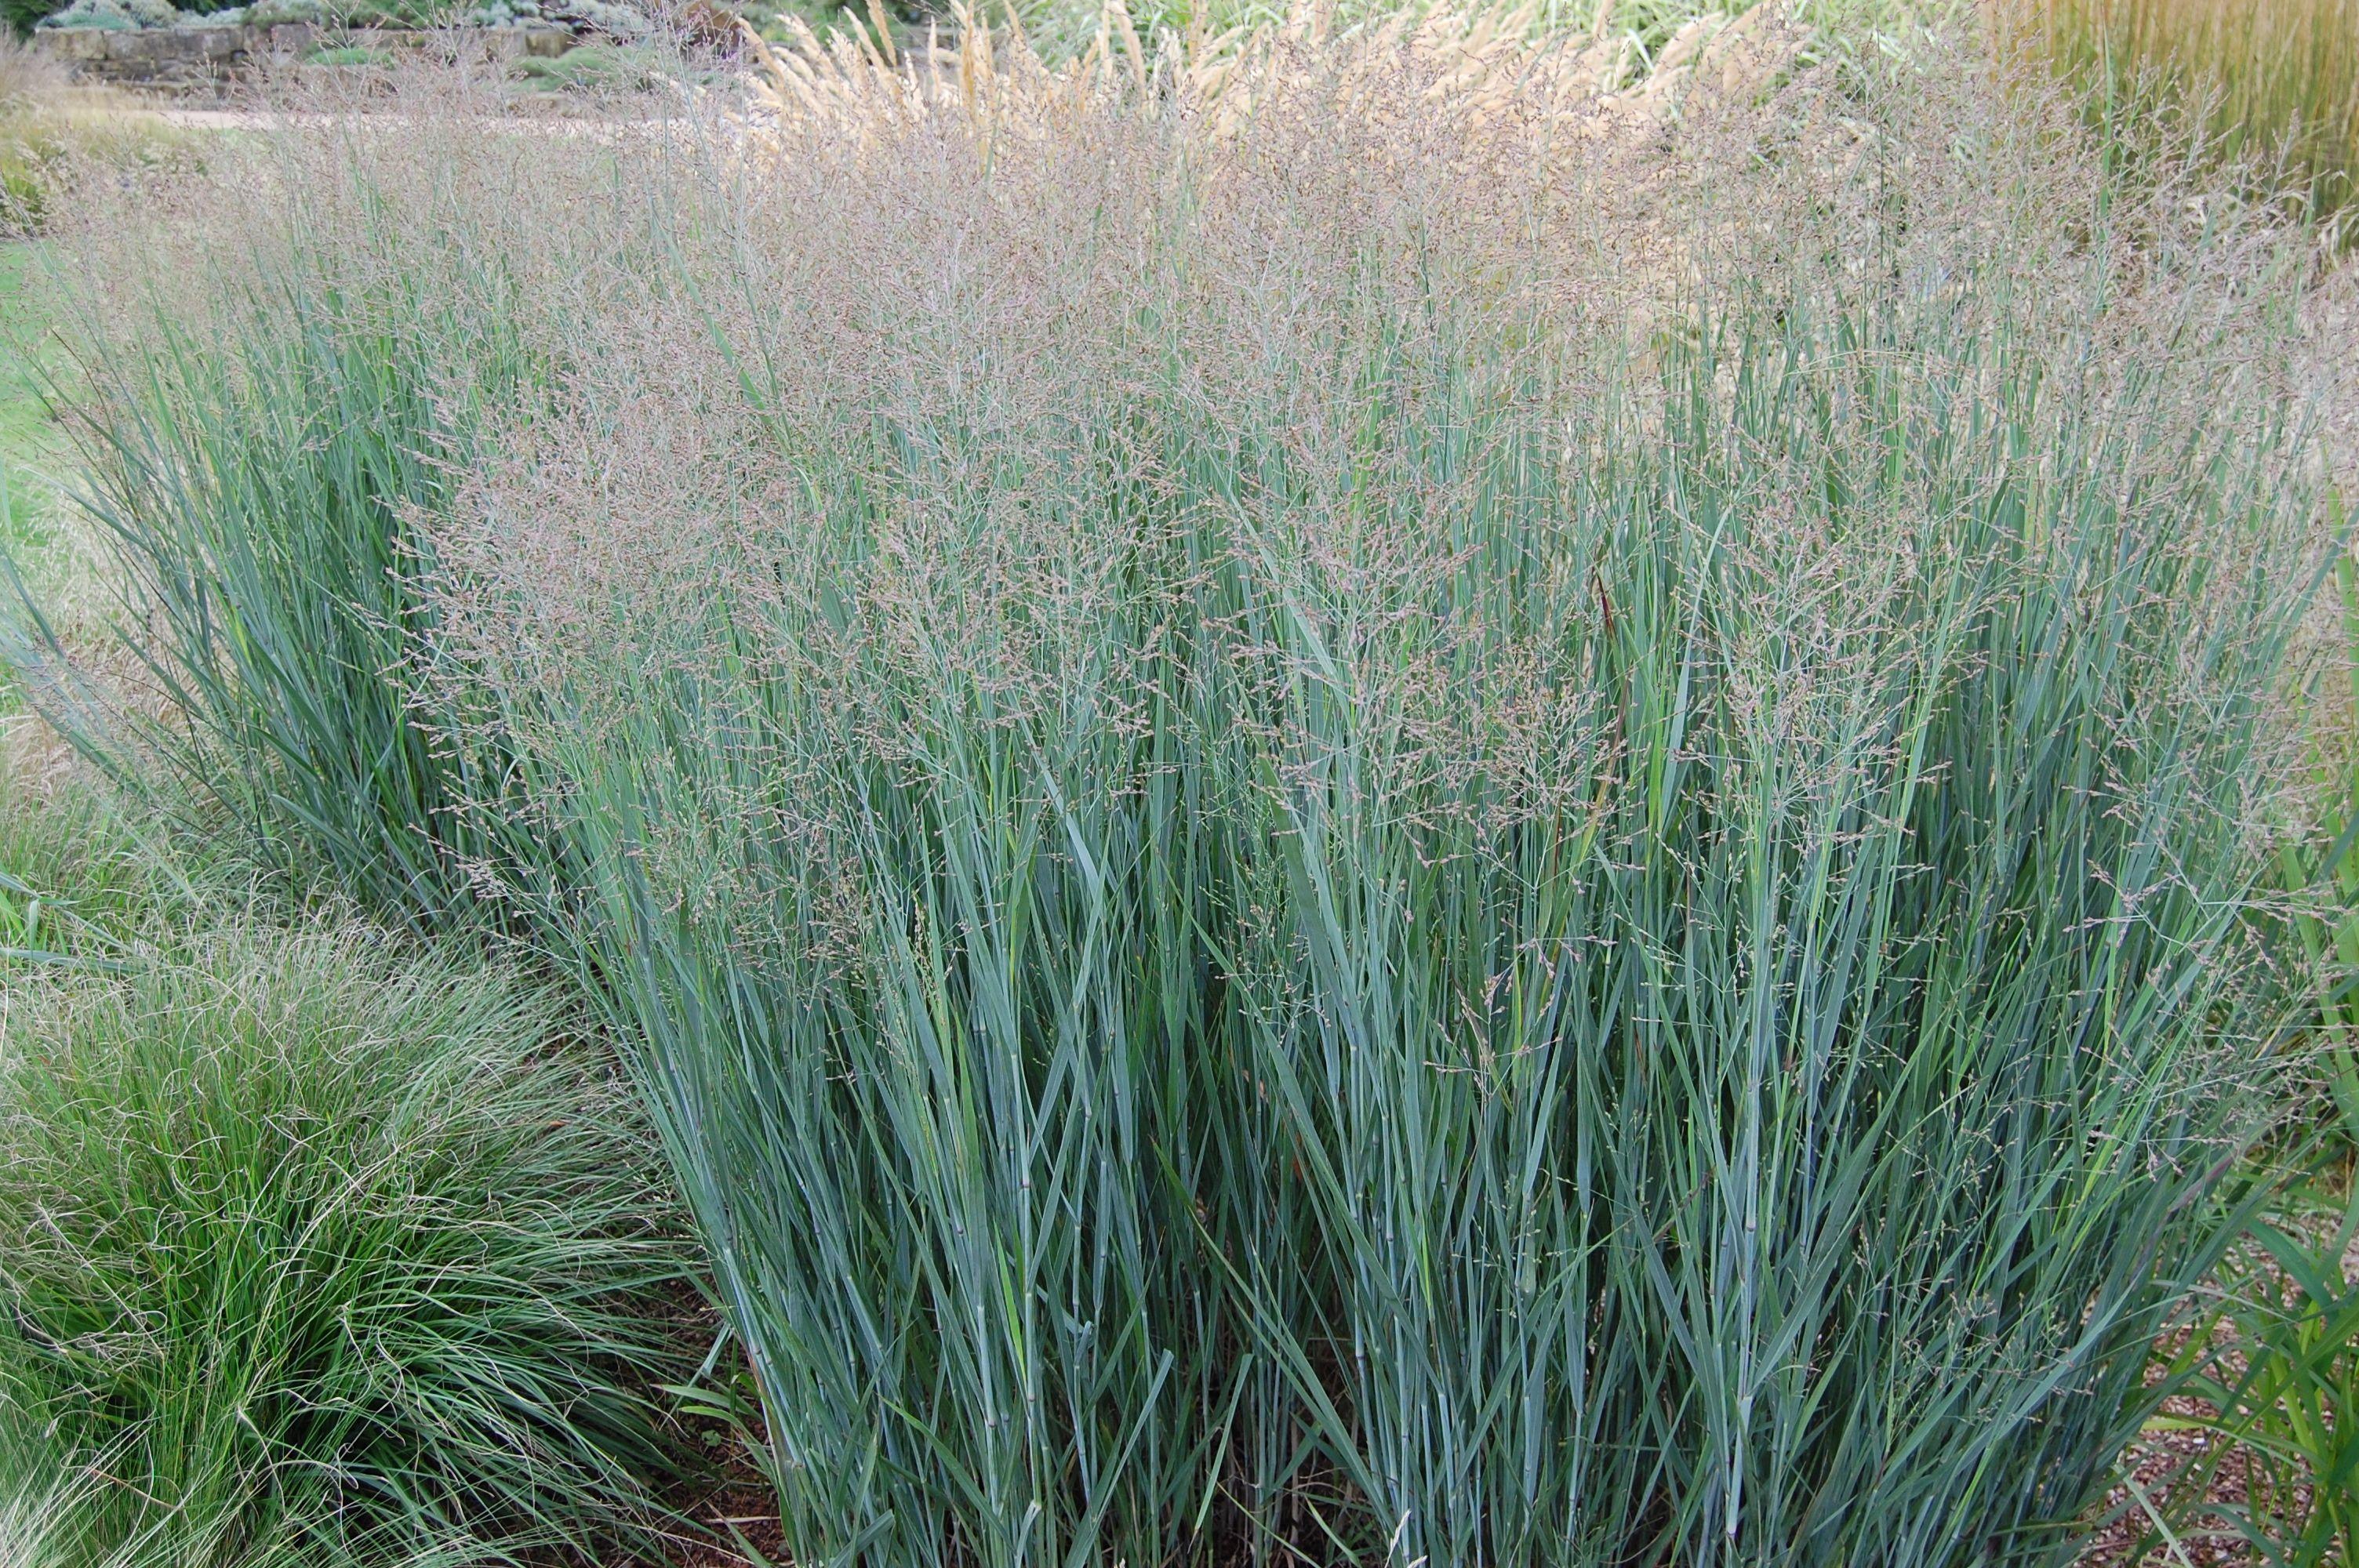 Panicum Virgatum Switchgrass Grass Deciduous Zones 5 9 4 X 3 Us And Great Lakes Native Sun L Grass For Sale Ornamental Grasses Warm Season Grass